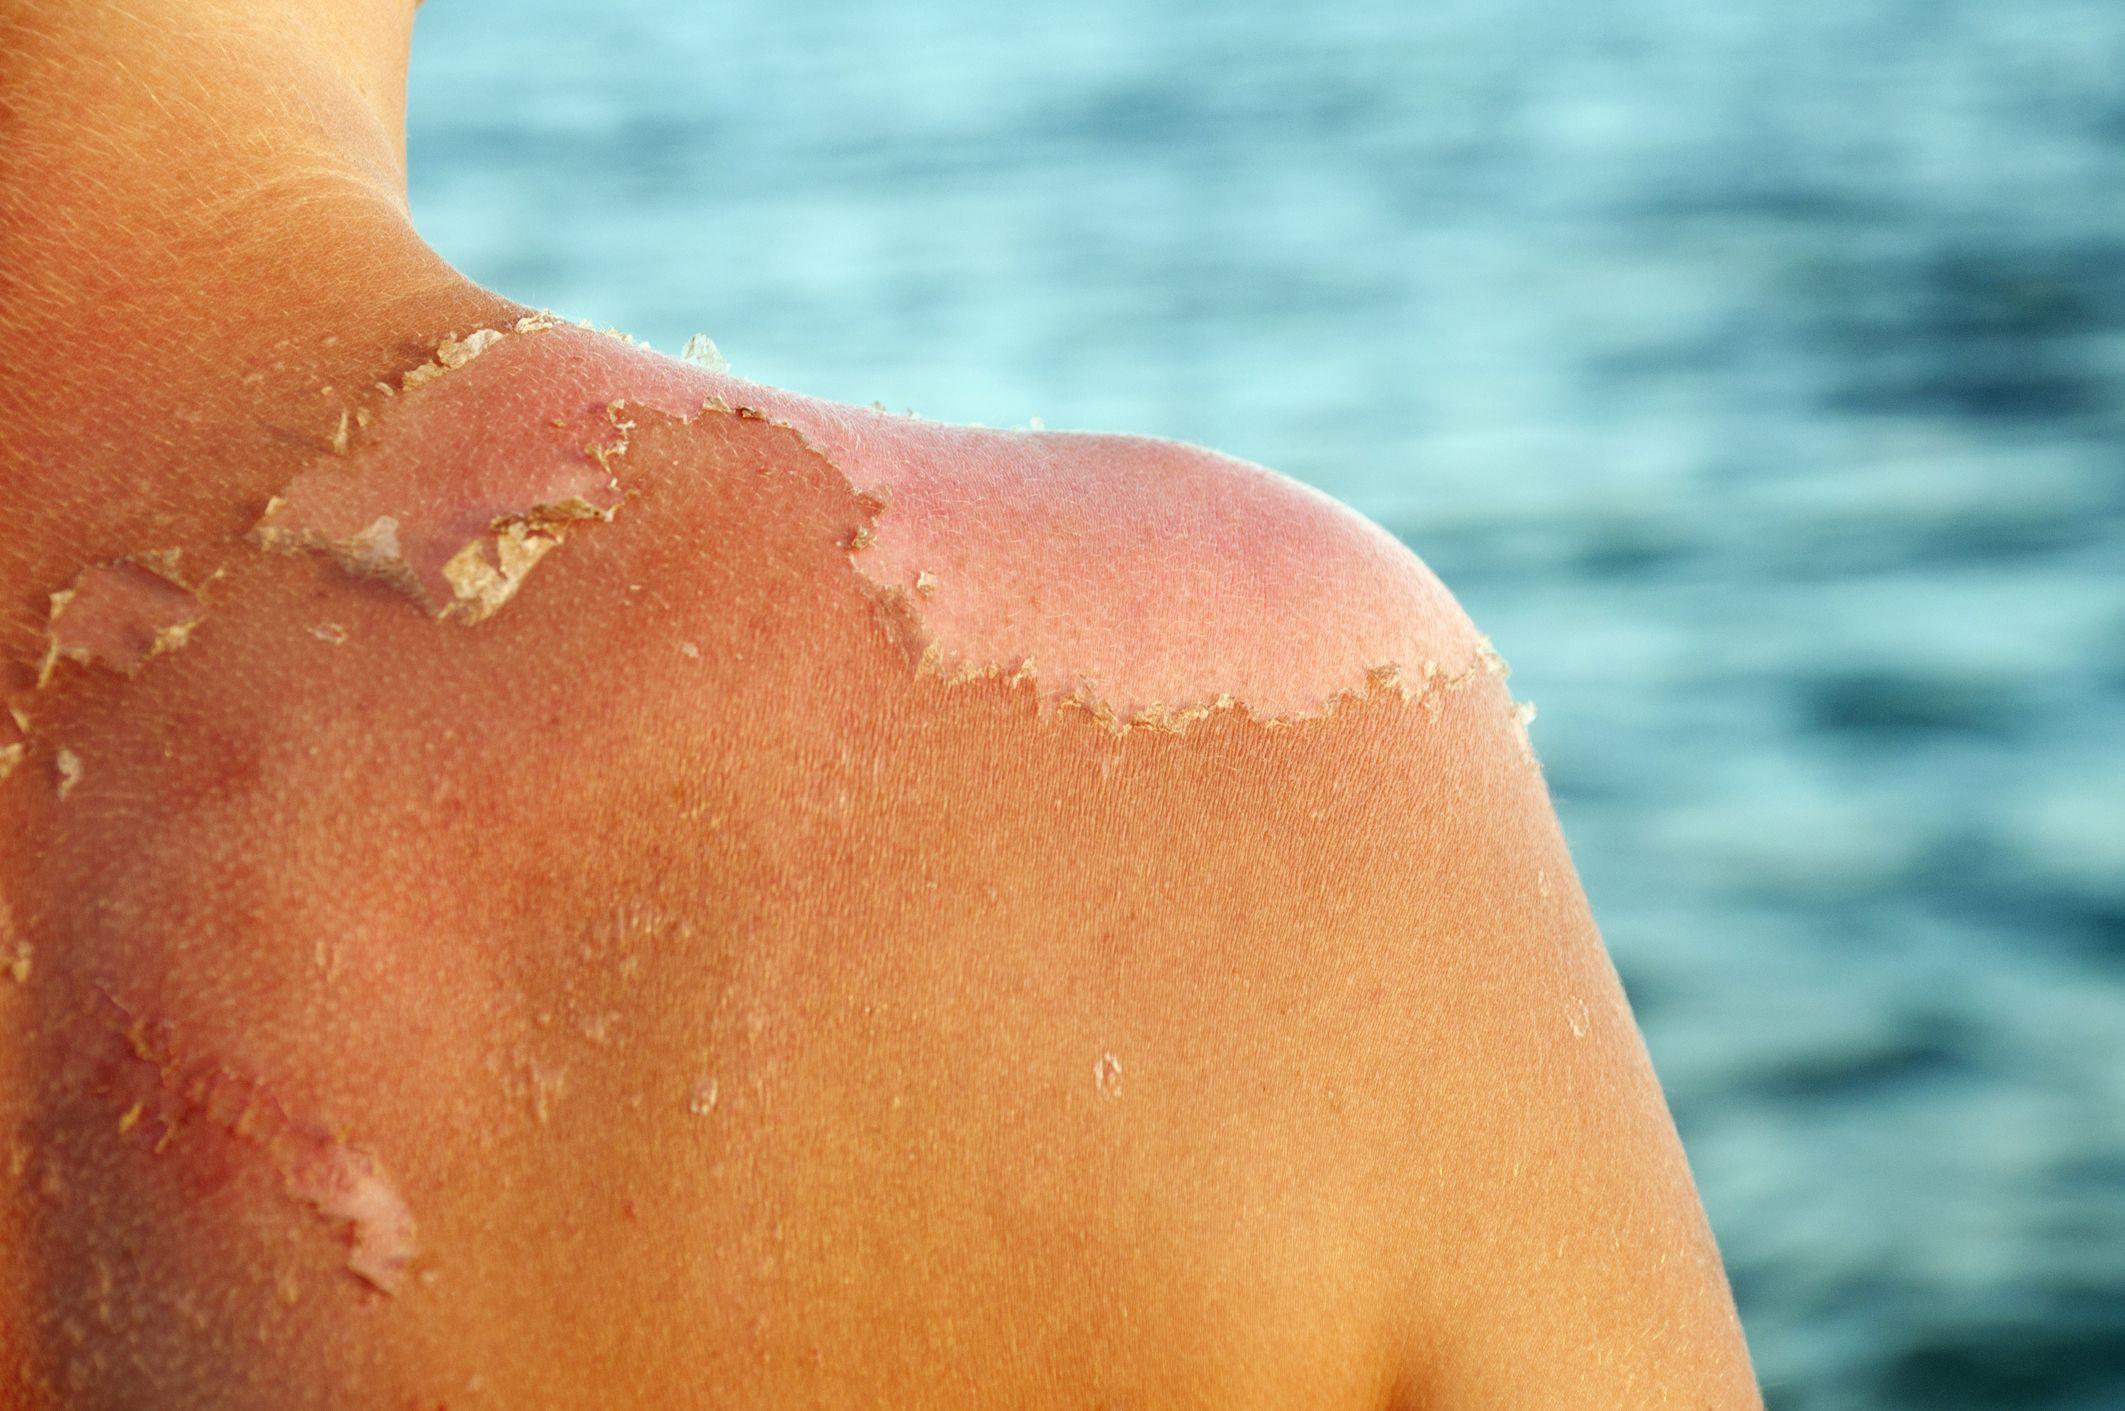 how to treat peeling skin